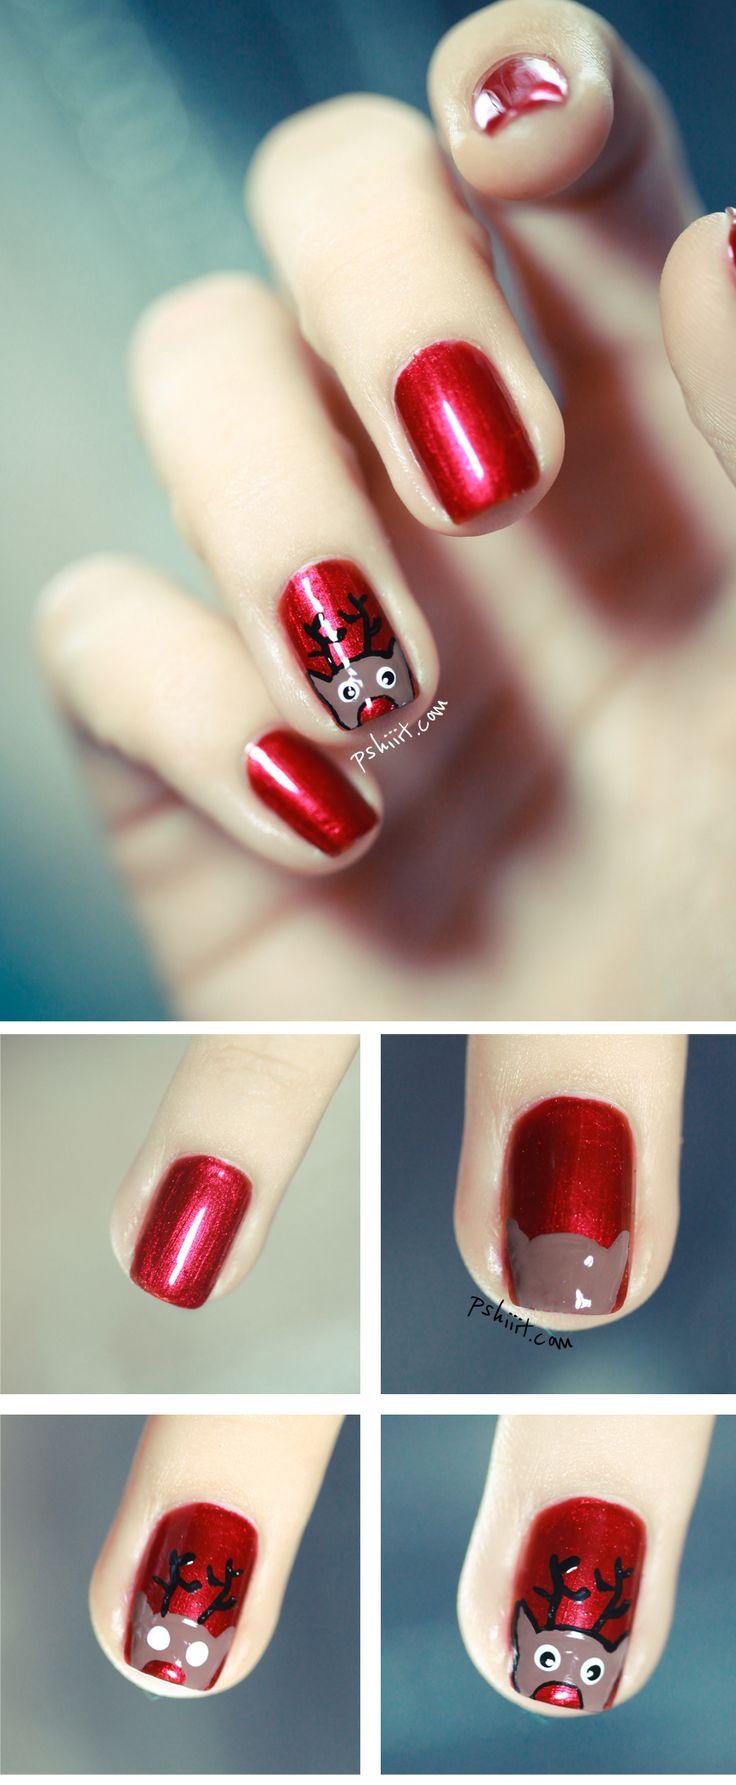 Rudolph / reindeer Christmas nail art tutorial pictorial